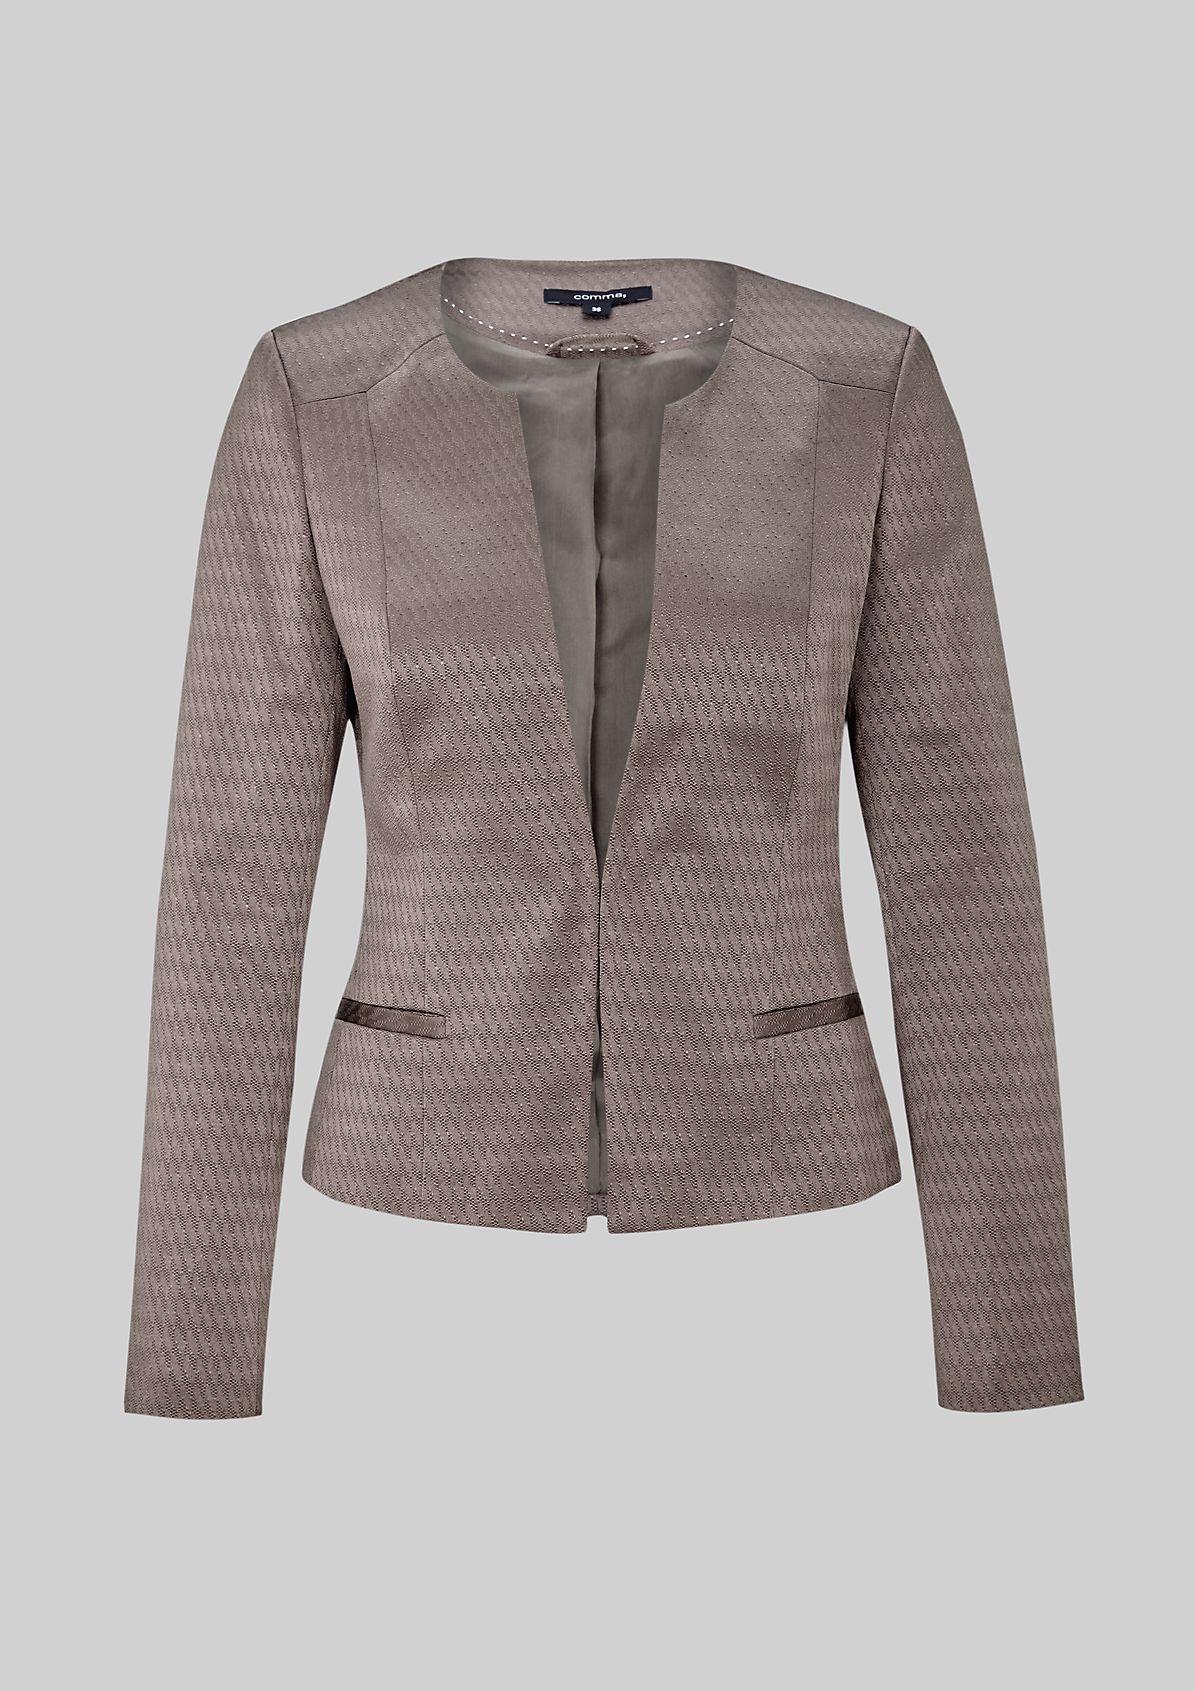 Elegant blazer in a glamorous jacquard design from s.Oliver